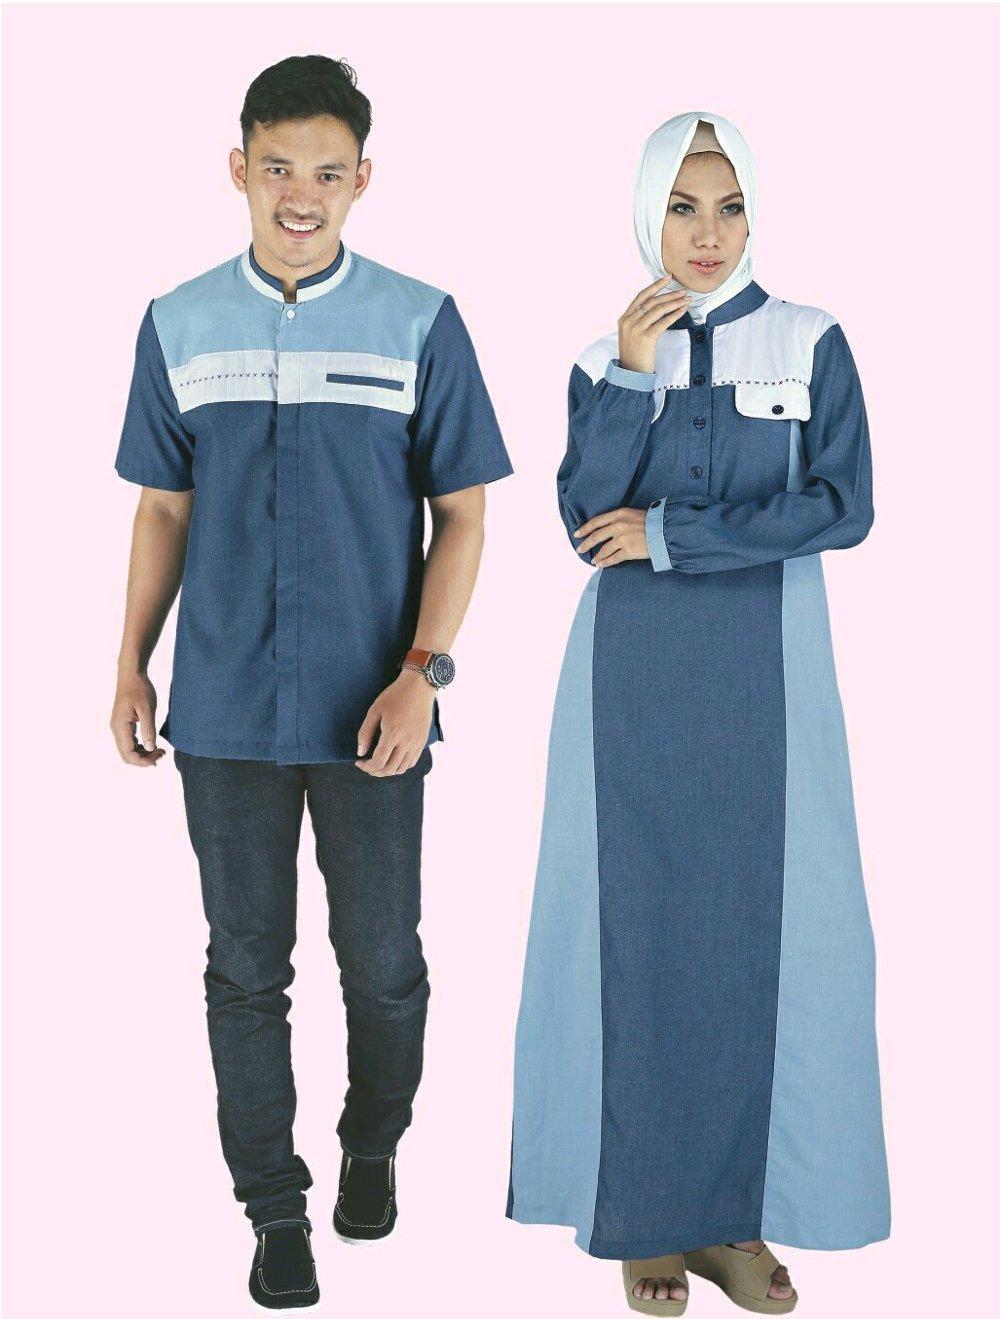 Baju Muslim COUPLE Raindoz 2179 2180 di lapak DISTRO GROSIR MURAH BANDUNG sepatumurahnian